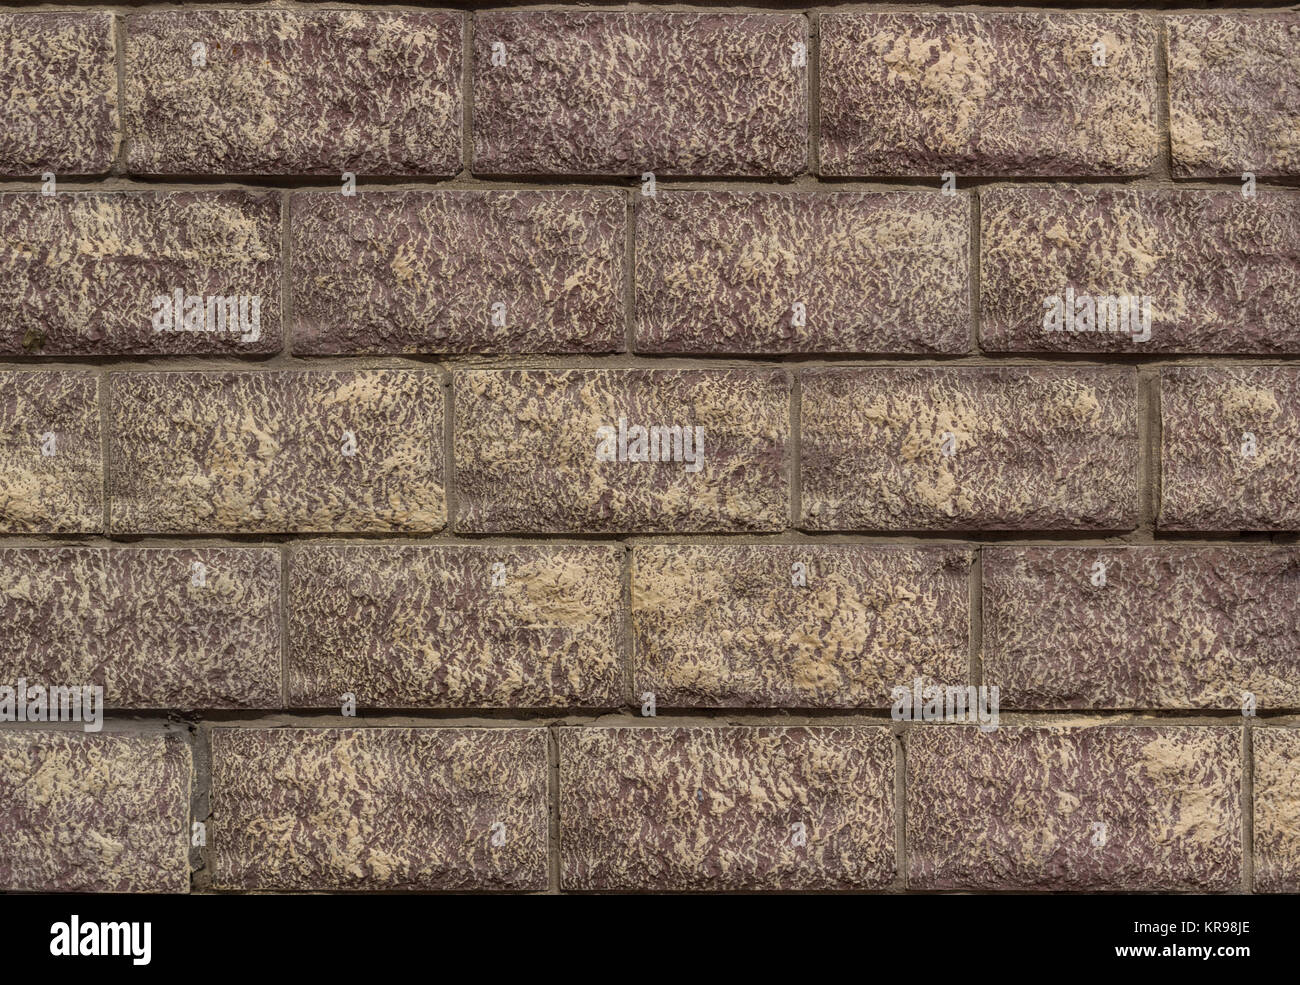 Bricks tiles wall texture background - Stock Image